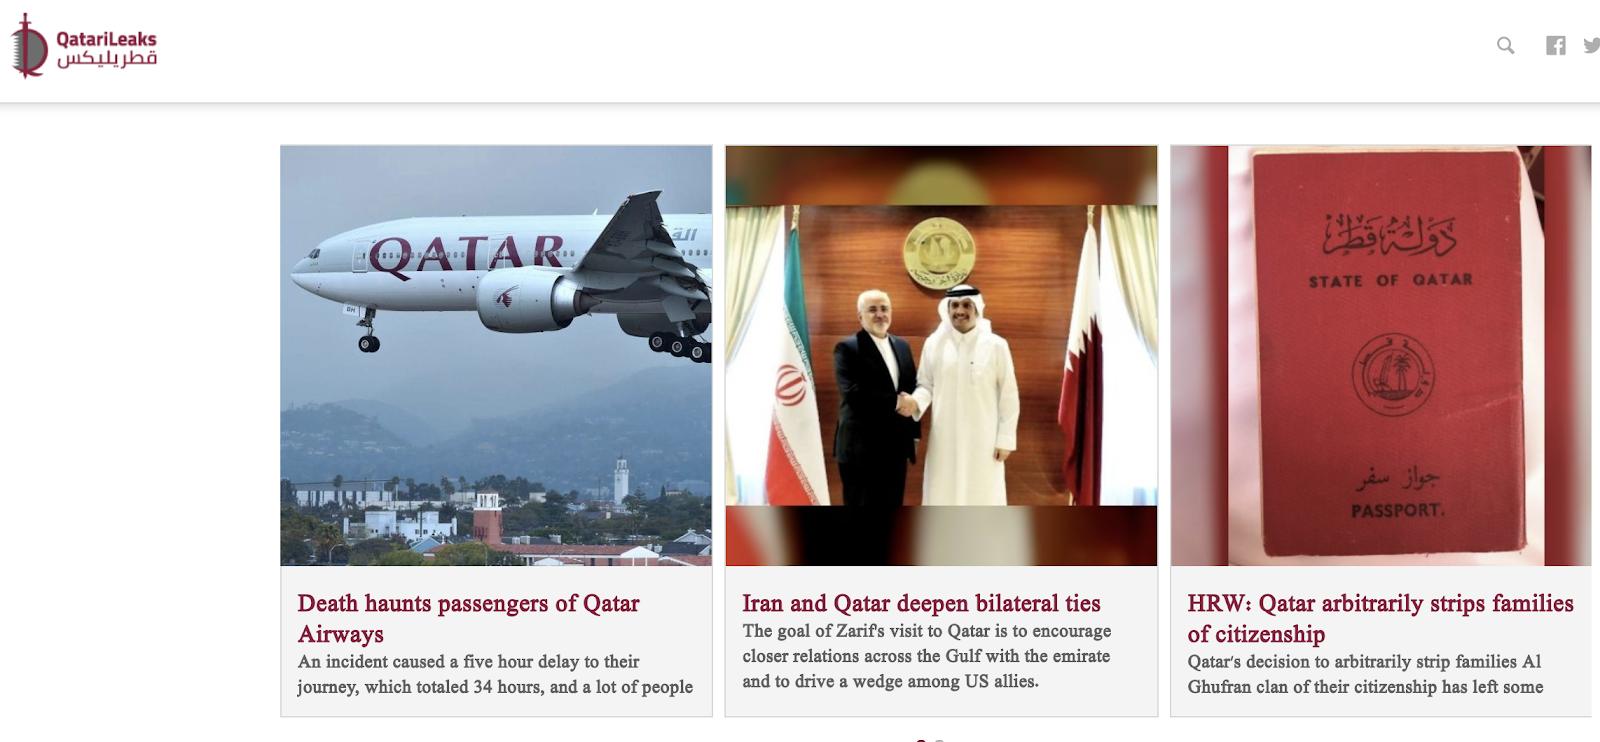 A screenshot of Qatarileaks.com/en, as seen on September 24, 2019.